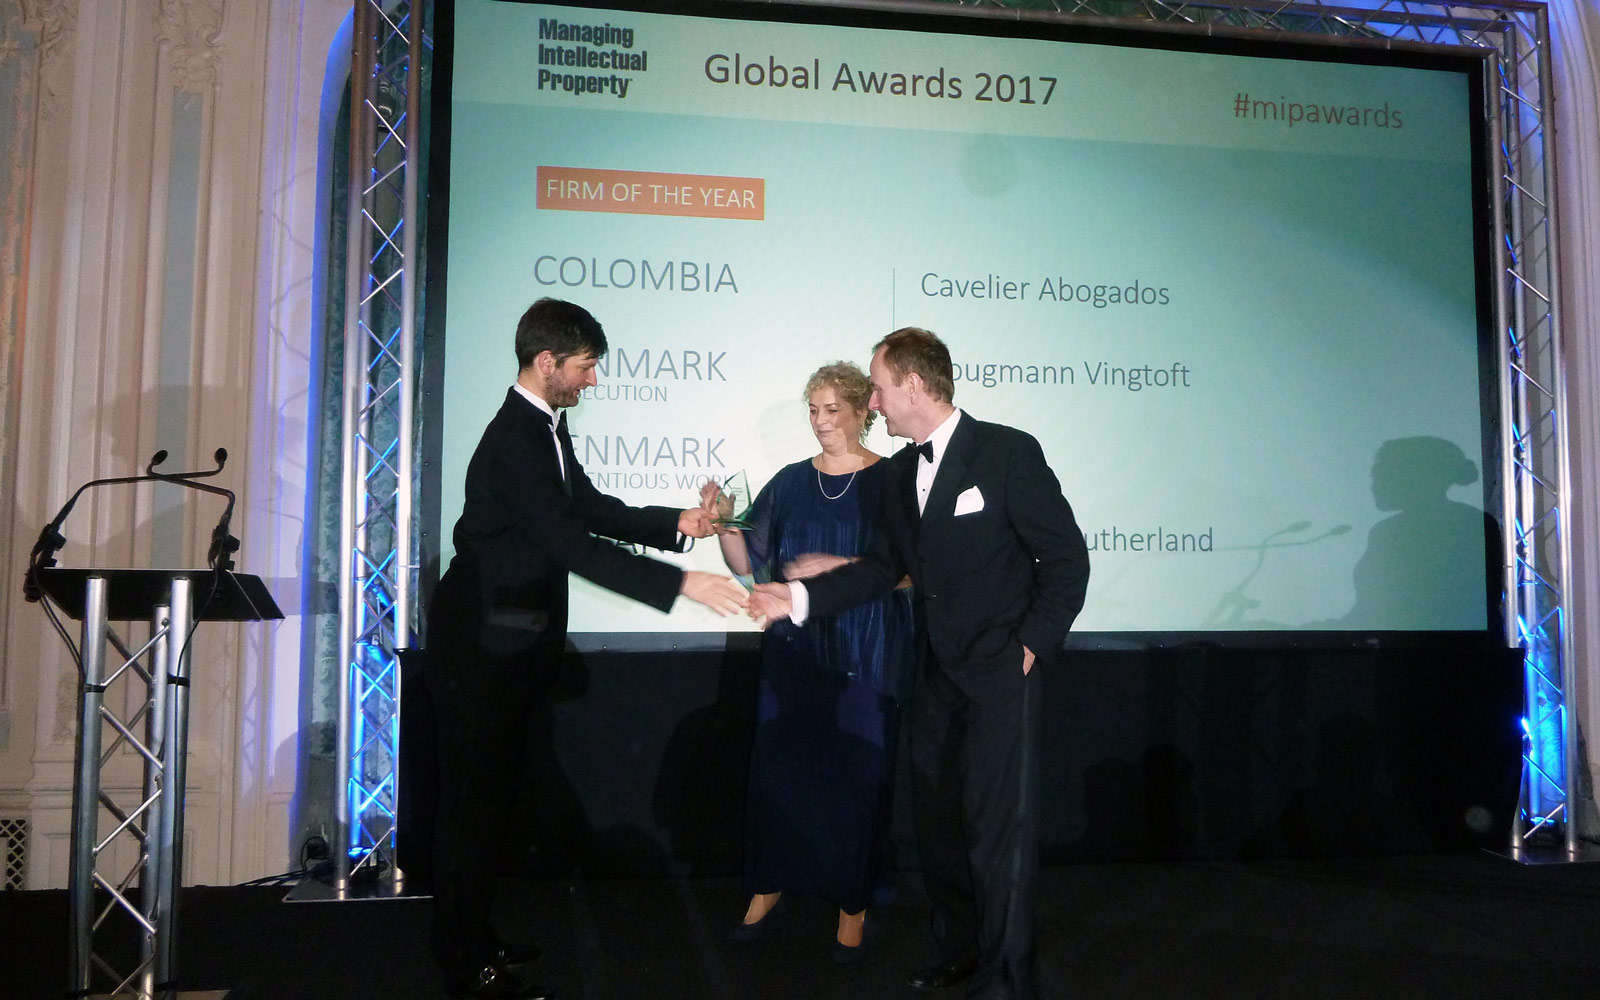 d33b22f736b Plougmann Vingtoft ranked as IP Firm of the Year 2017 for Denmark